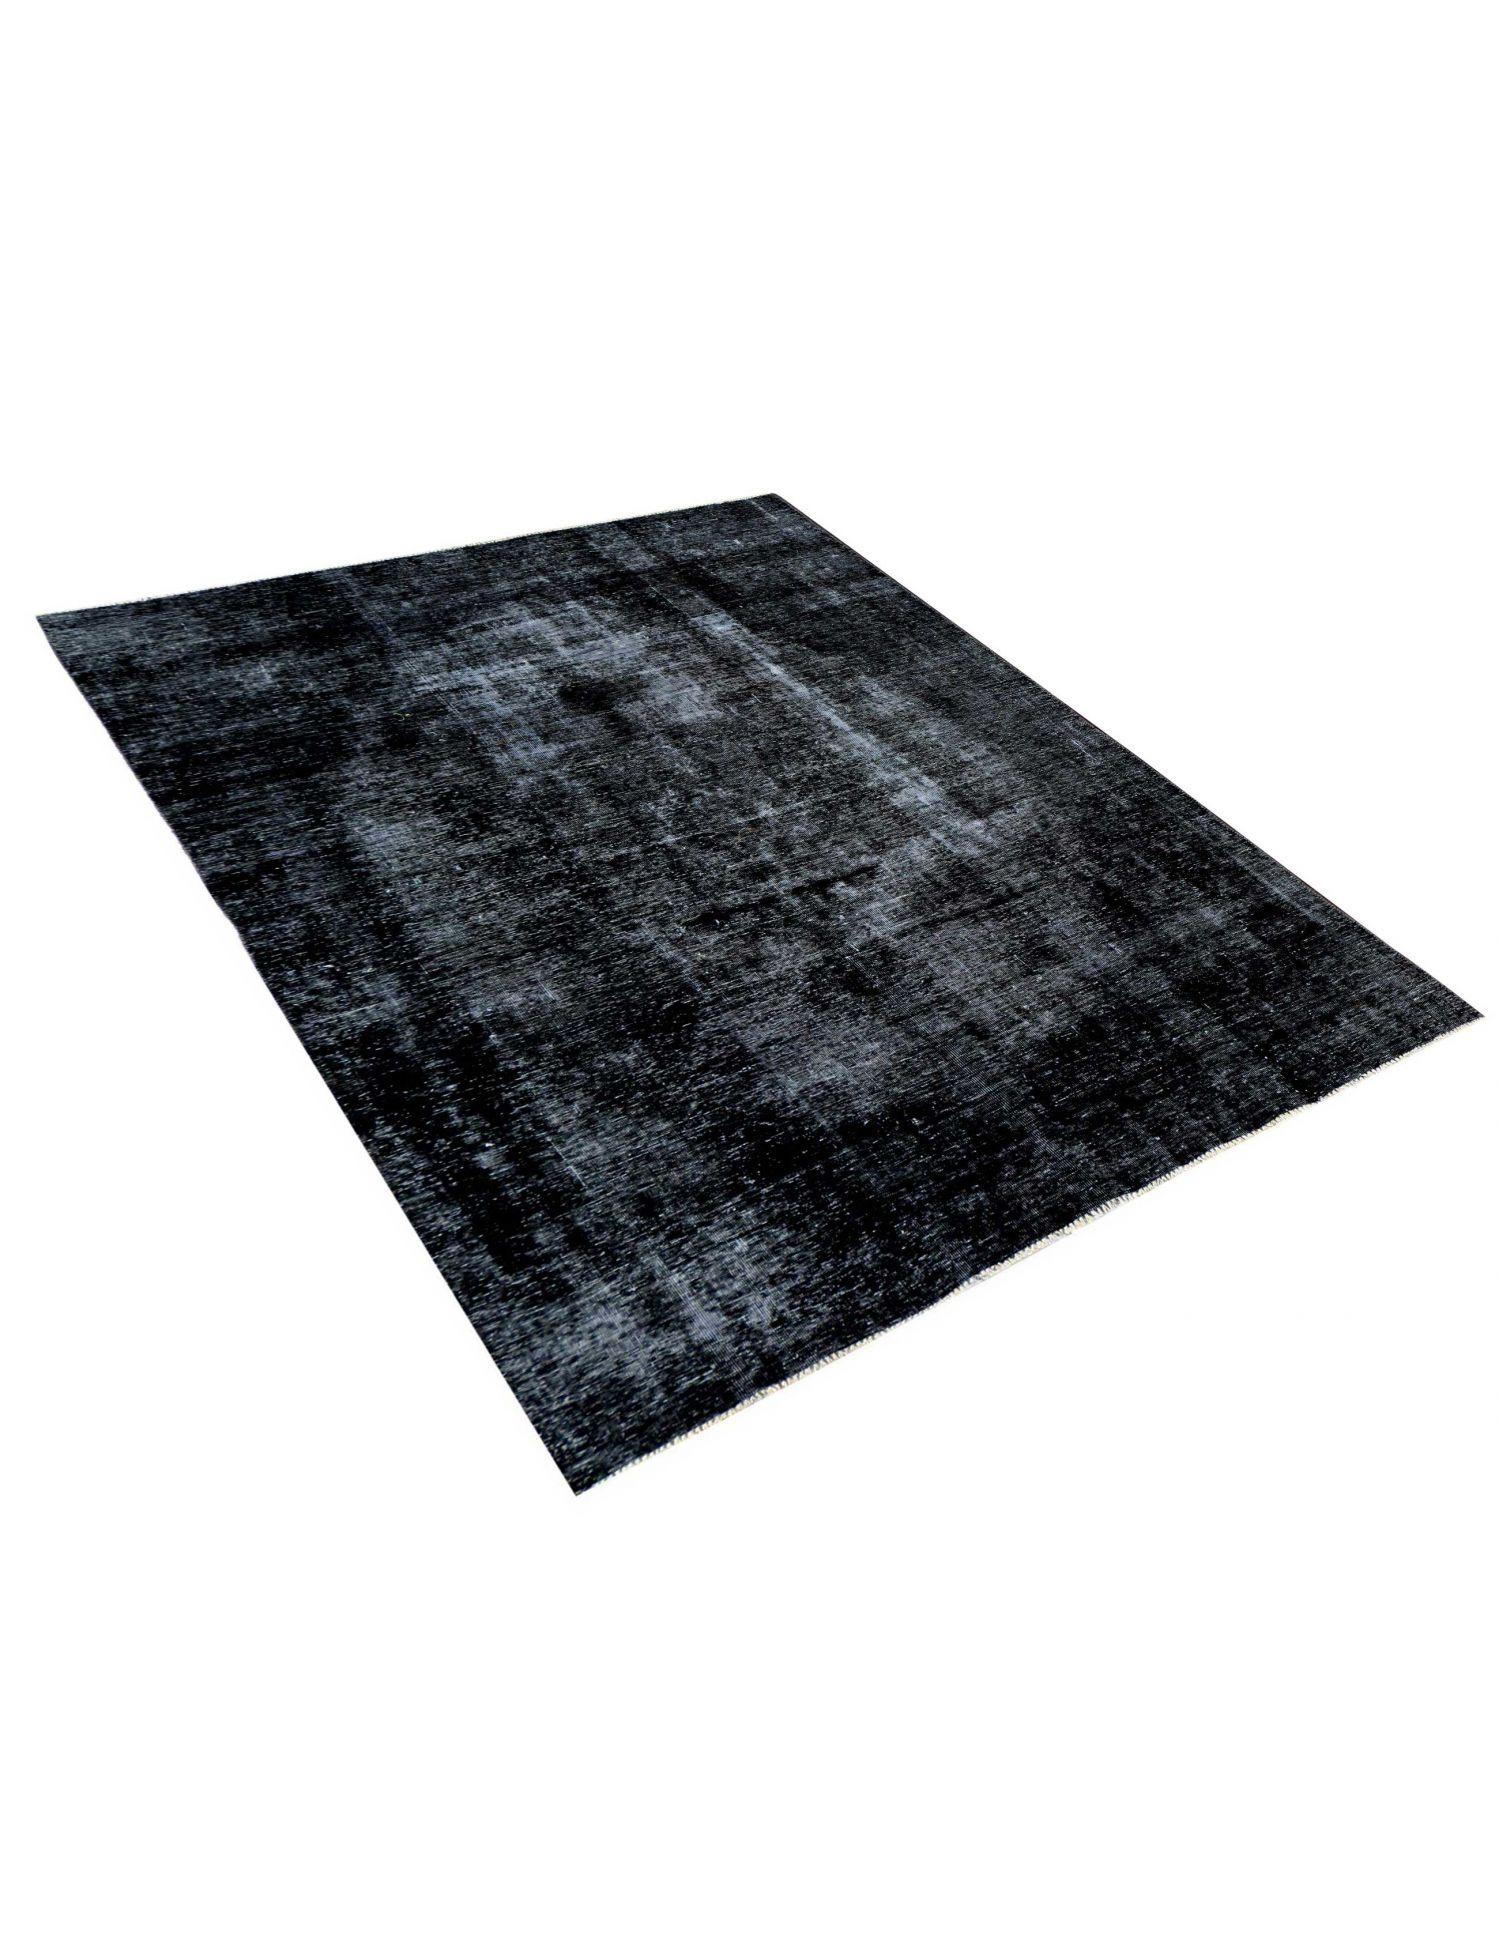 Vintage Carpet  black <br/>268 x 203 cm